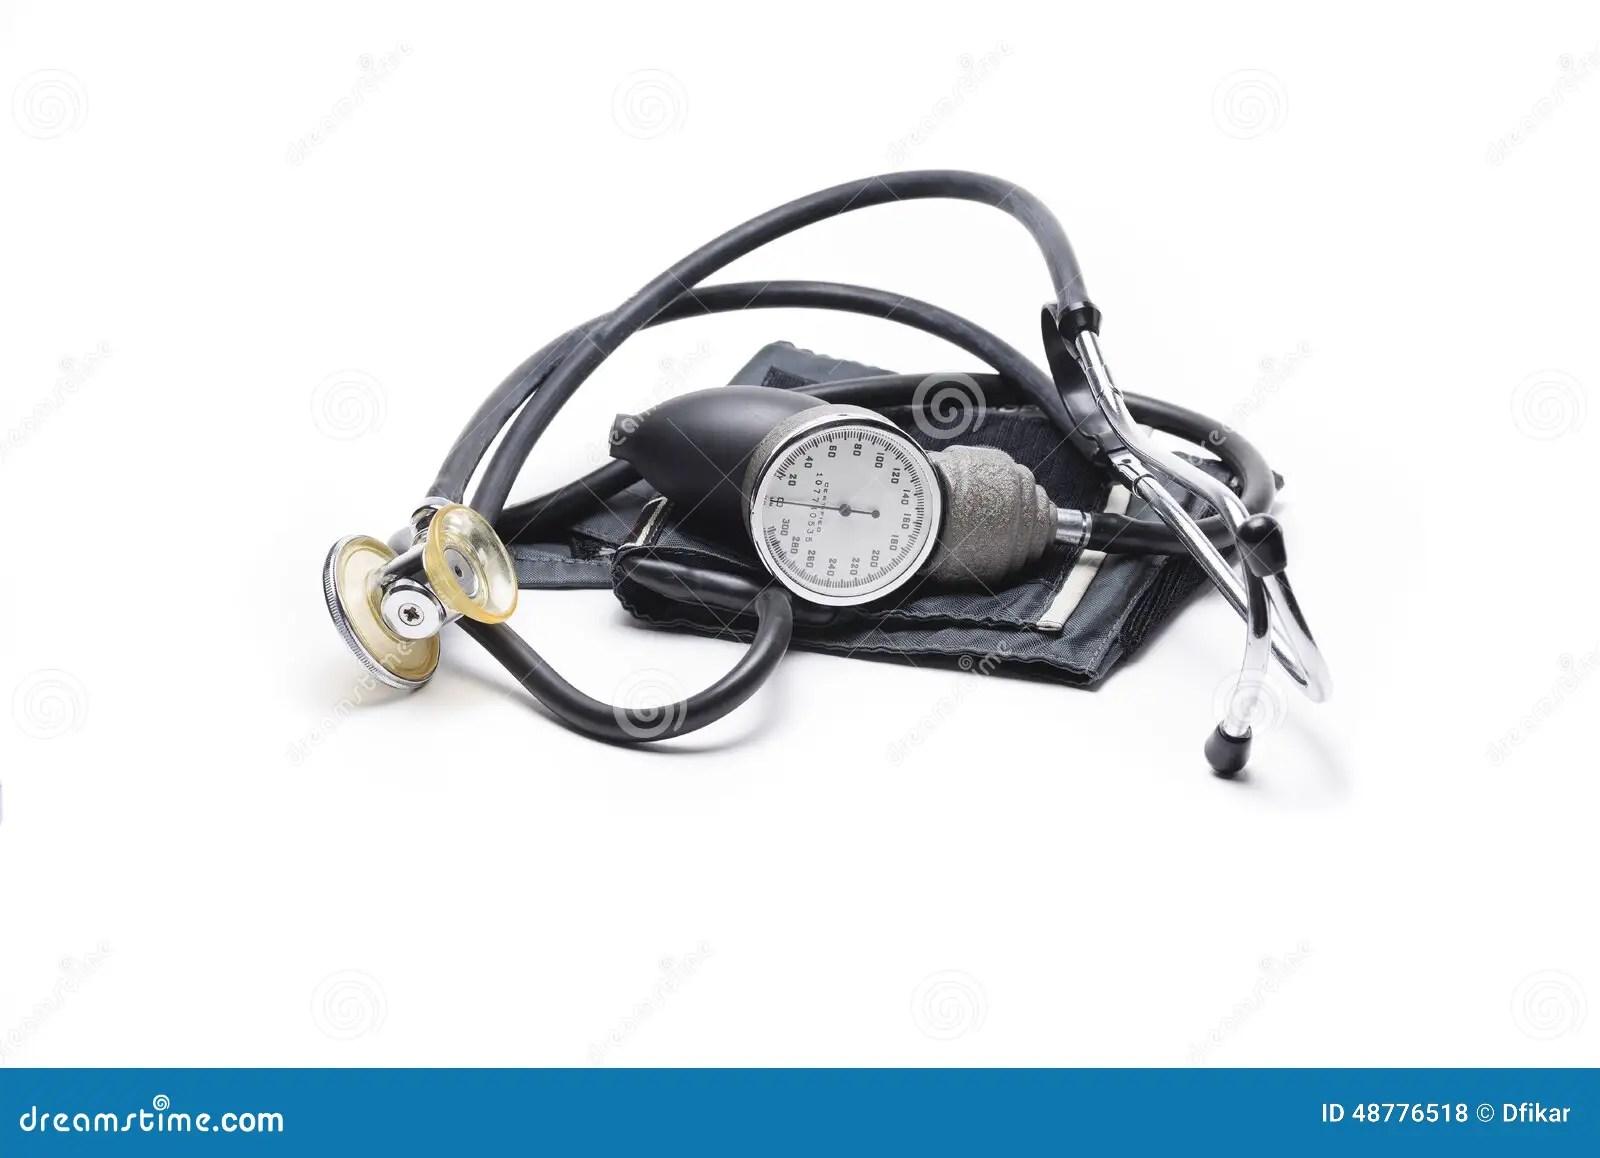 Sphygmomanometer And Stethoscope Stock Photo